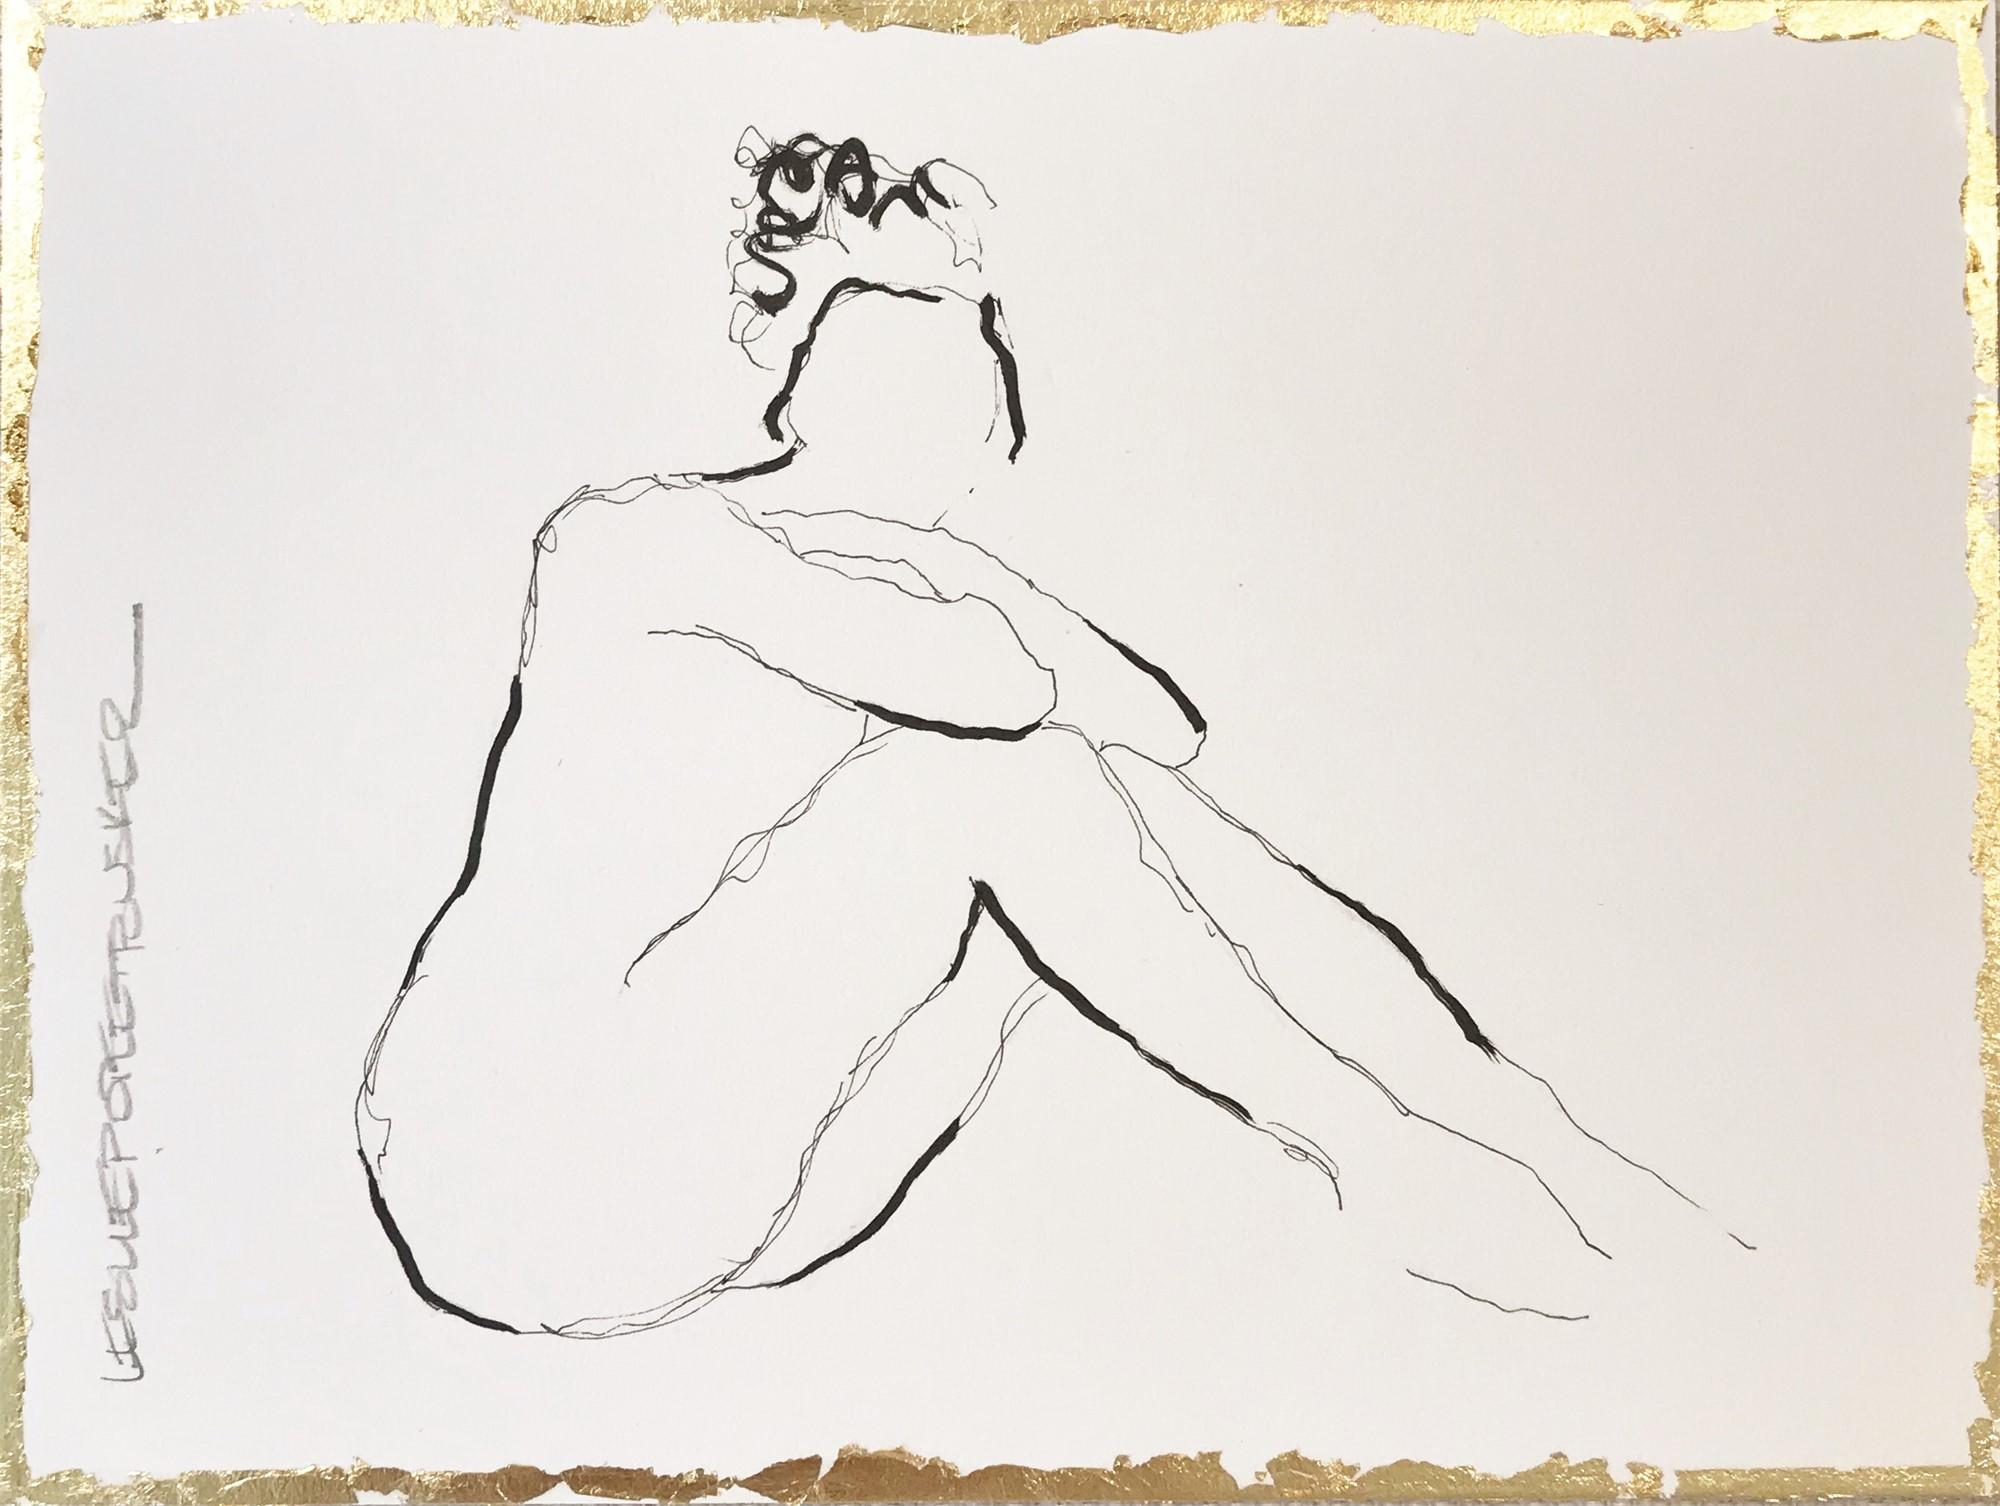 Figure No. 88 by Leslie Poteet Busker